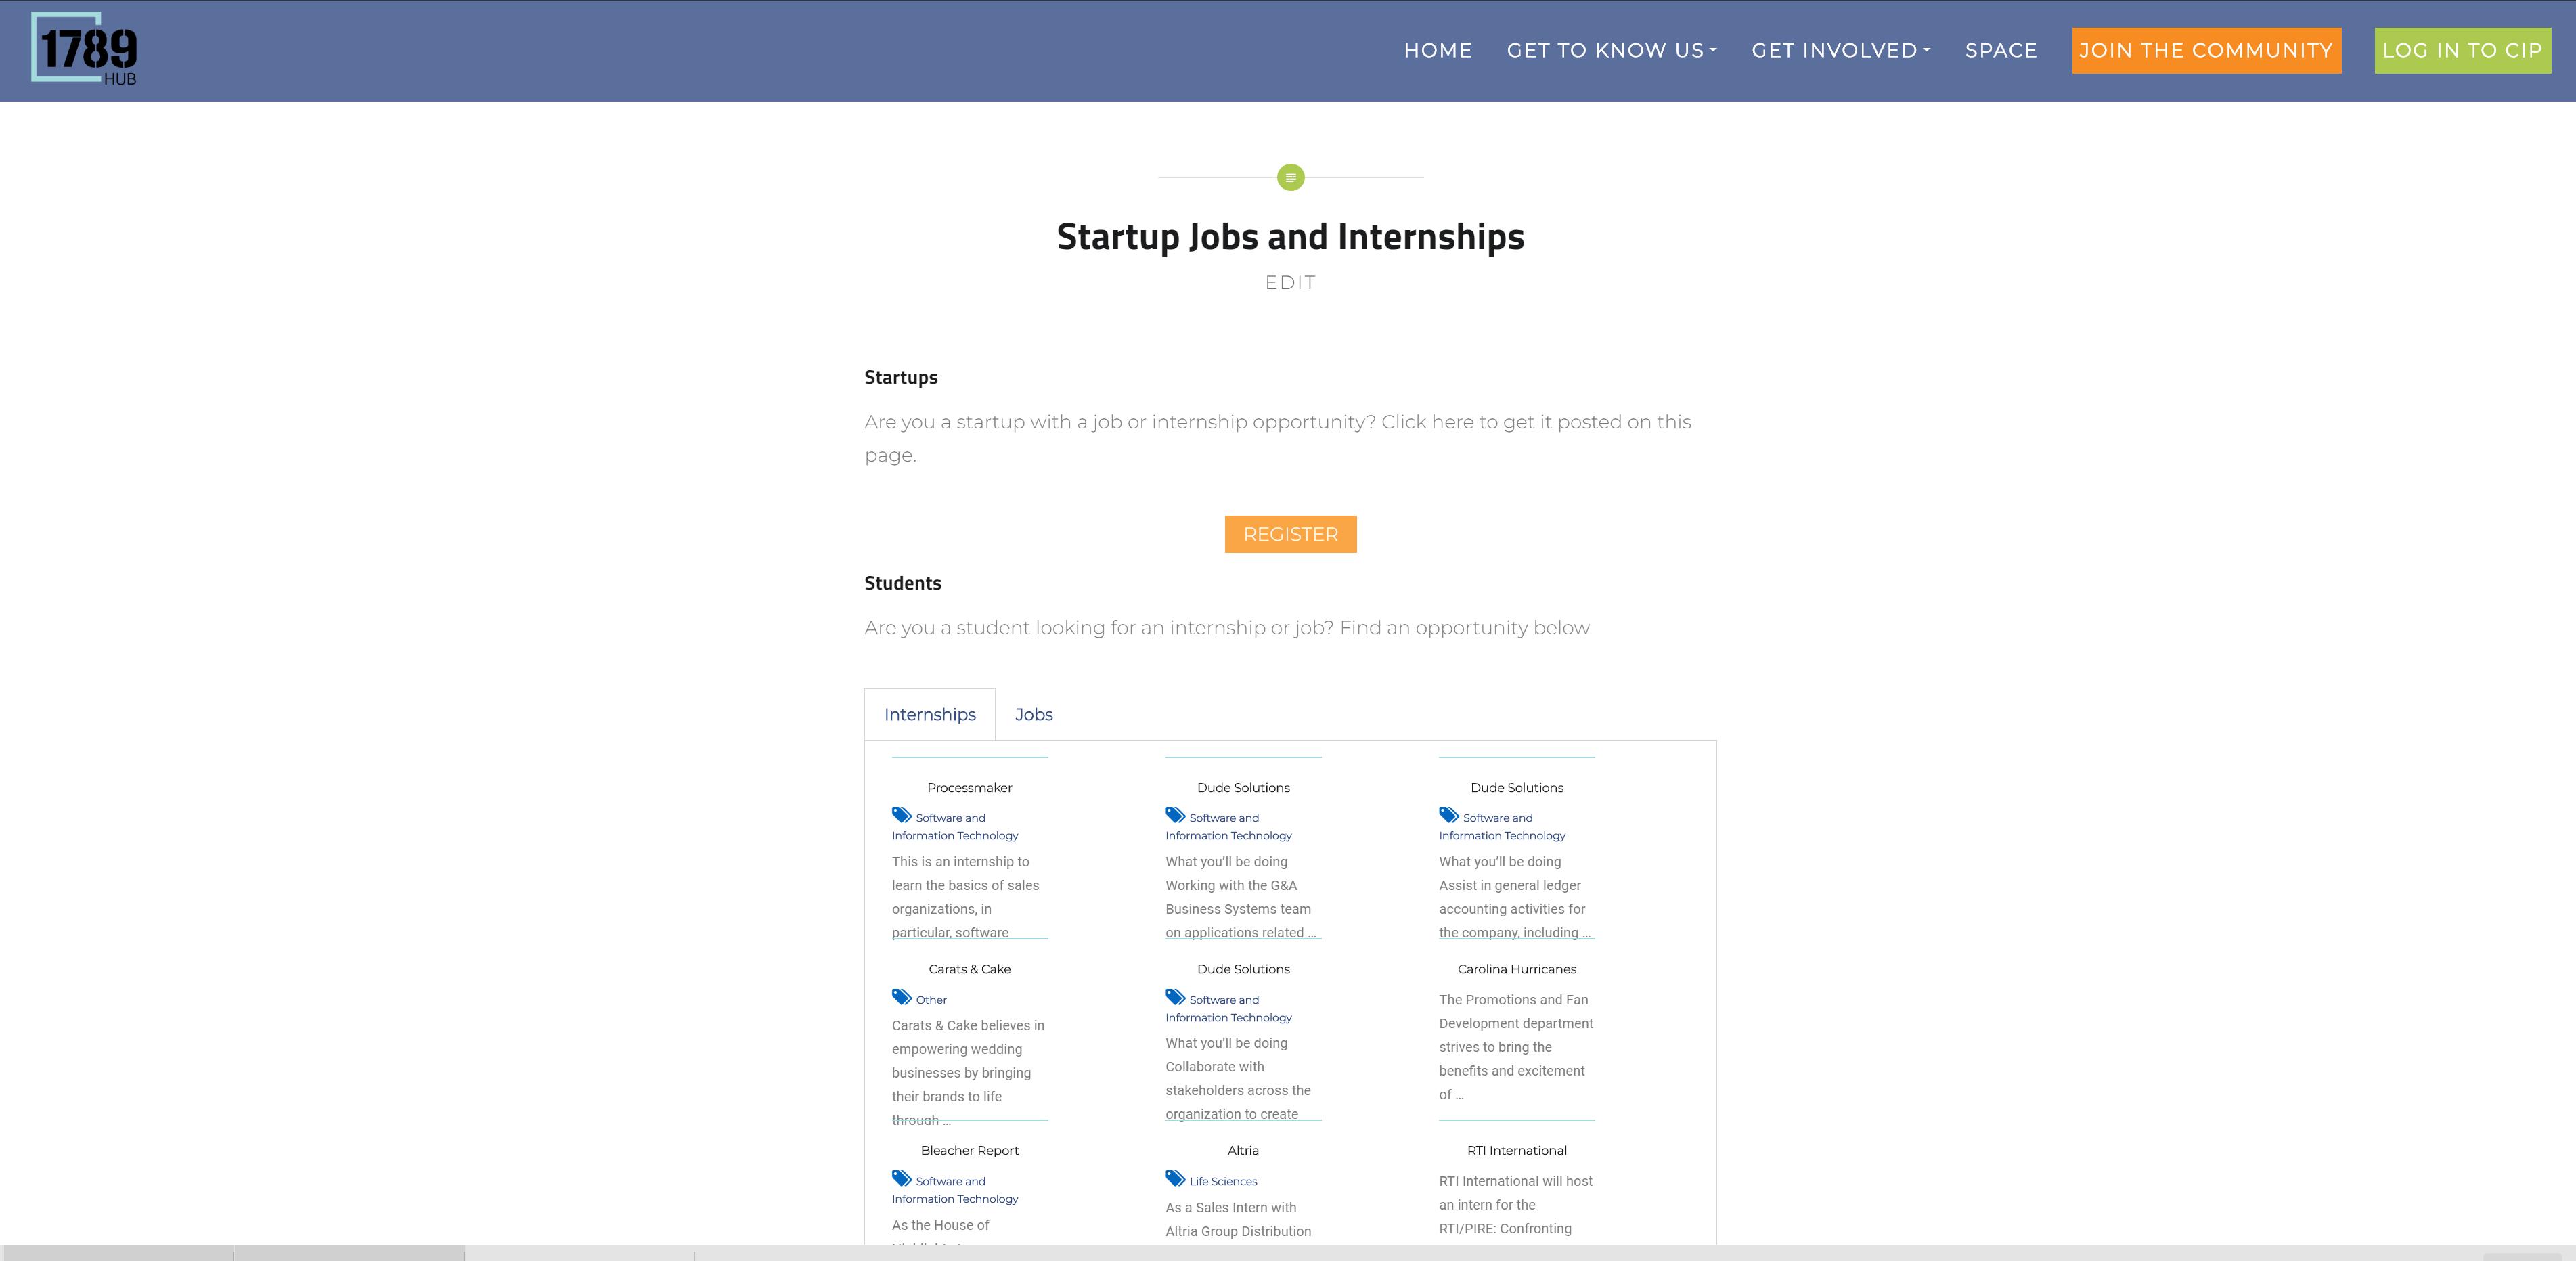 Screenshot of 1789 startup jobs and internships page